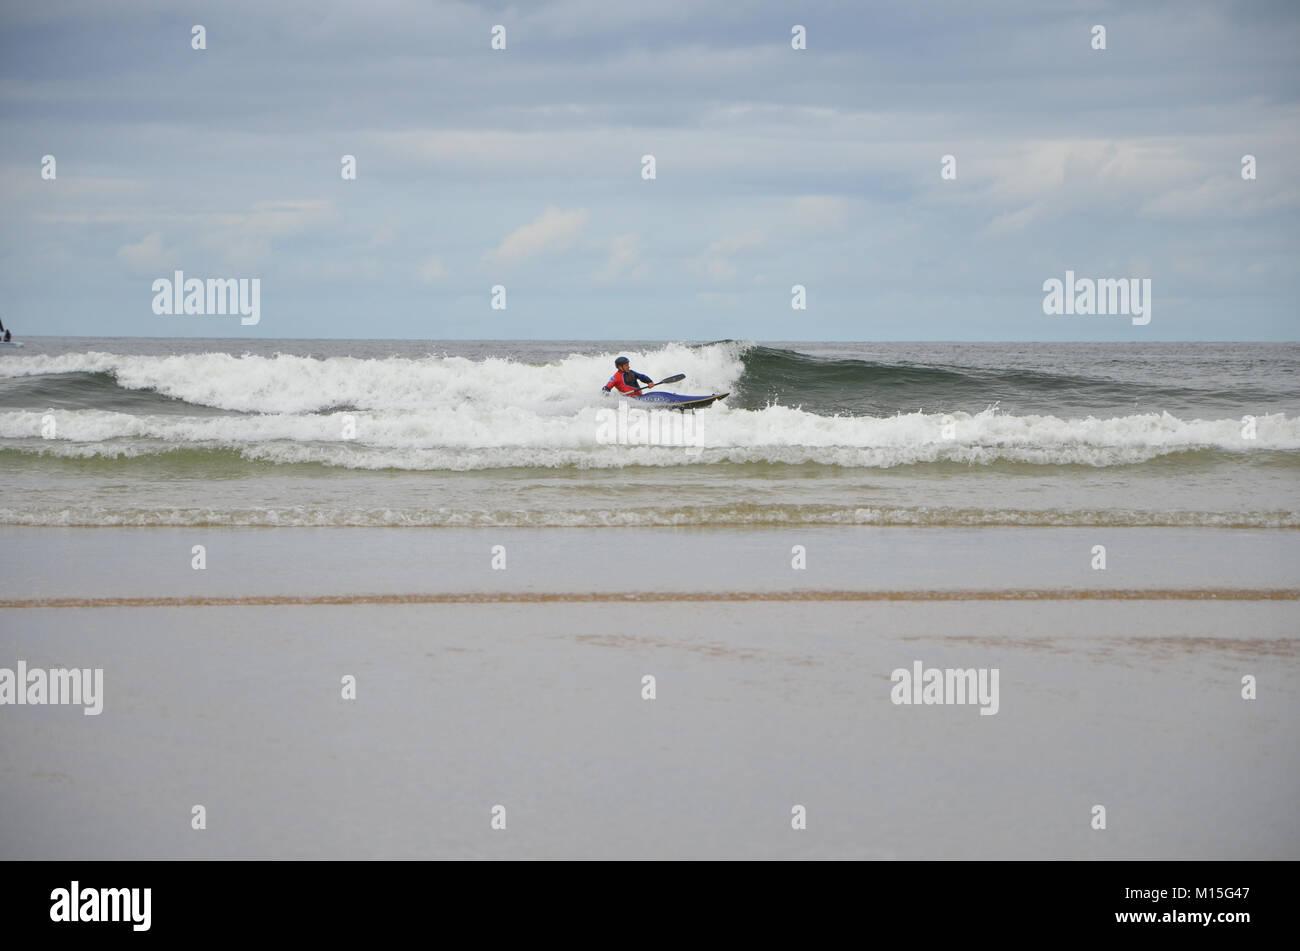 Portrush, Co.Antrim, Irlanda del Norte. 6 Agosto 2013 Un Kayakista aborda las olas en West Bay Portrush Foto de stock